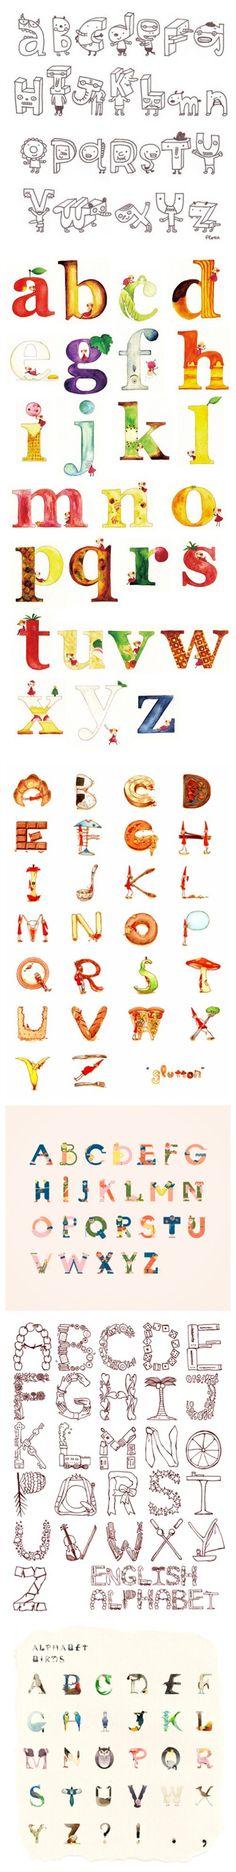 Lettering, Artist Study Resources for Art Students, CAPI ::: Create Art Portfolio Ideas at milliande.com , Inspiration for Art School Portfolio Work, Letters, Alphabet, Art Journal, Lettering